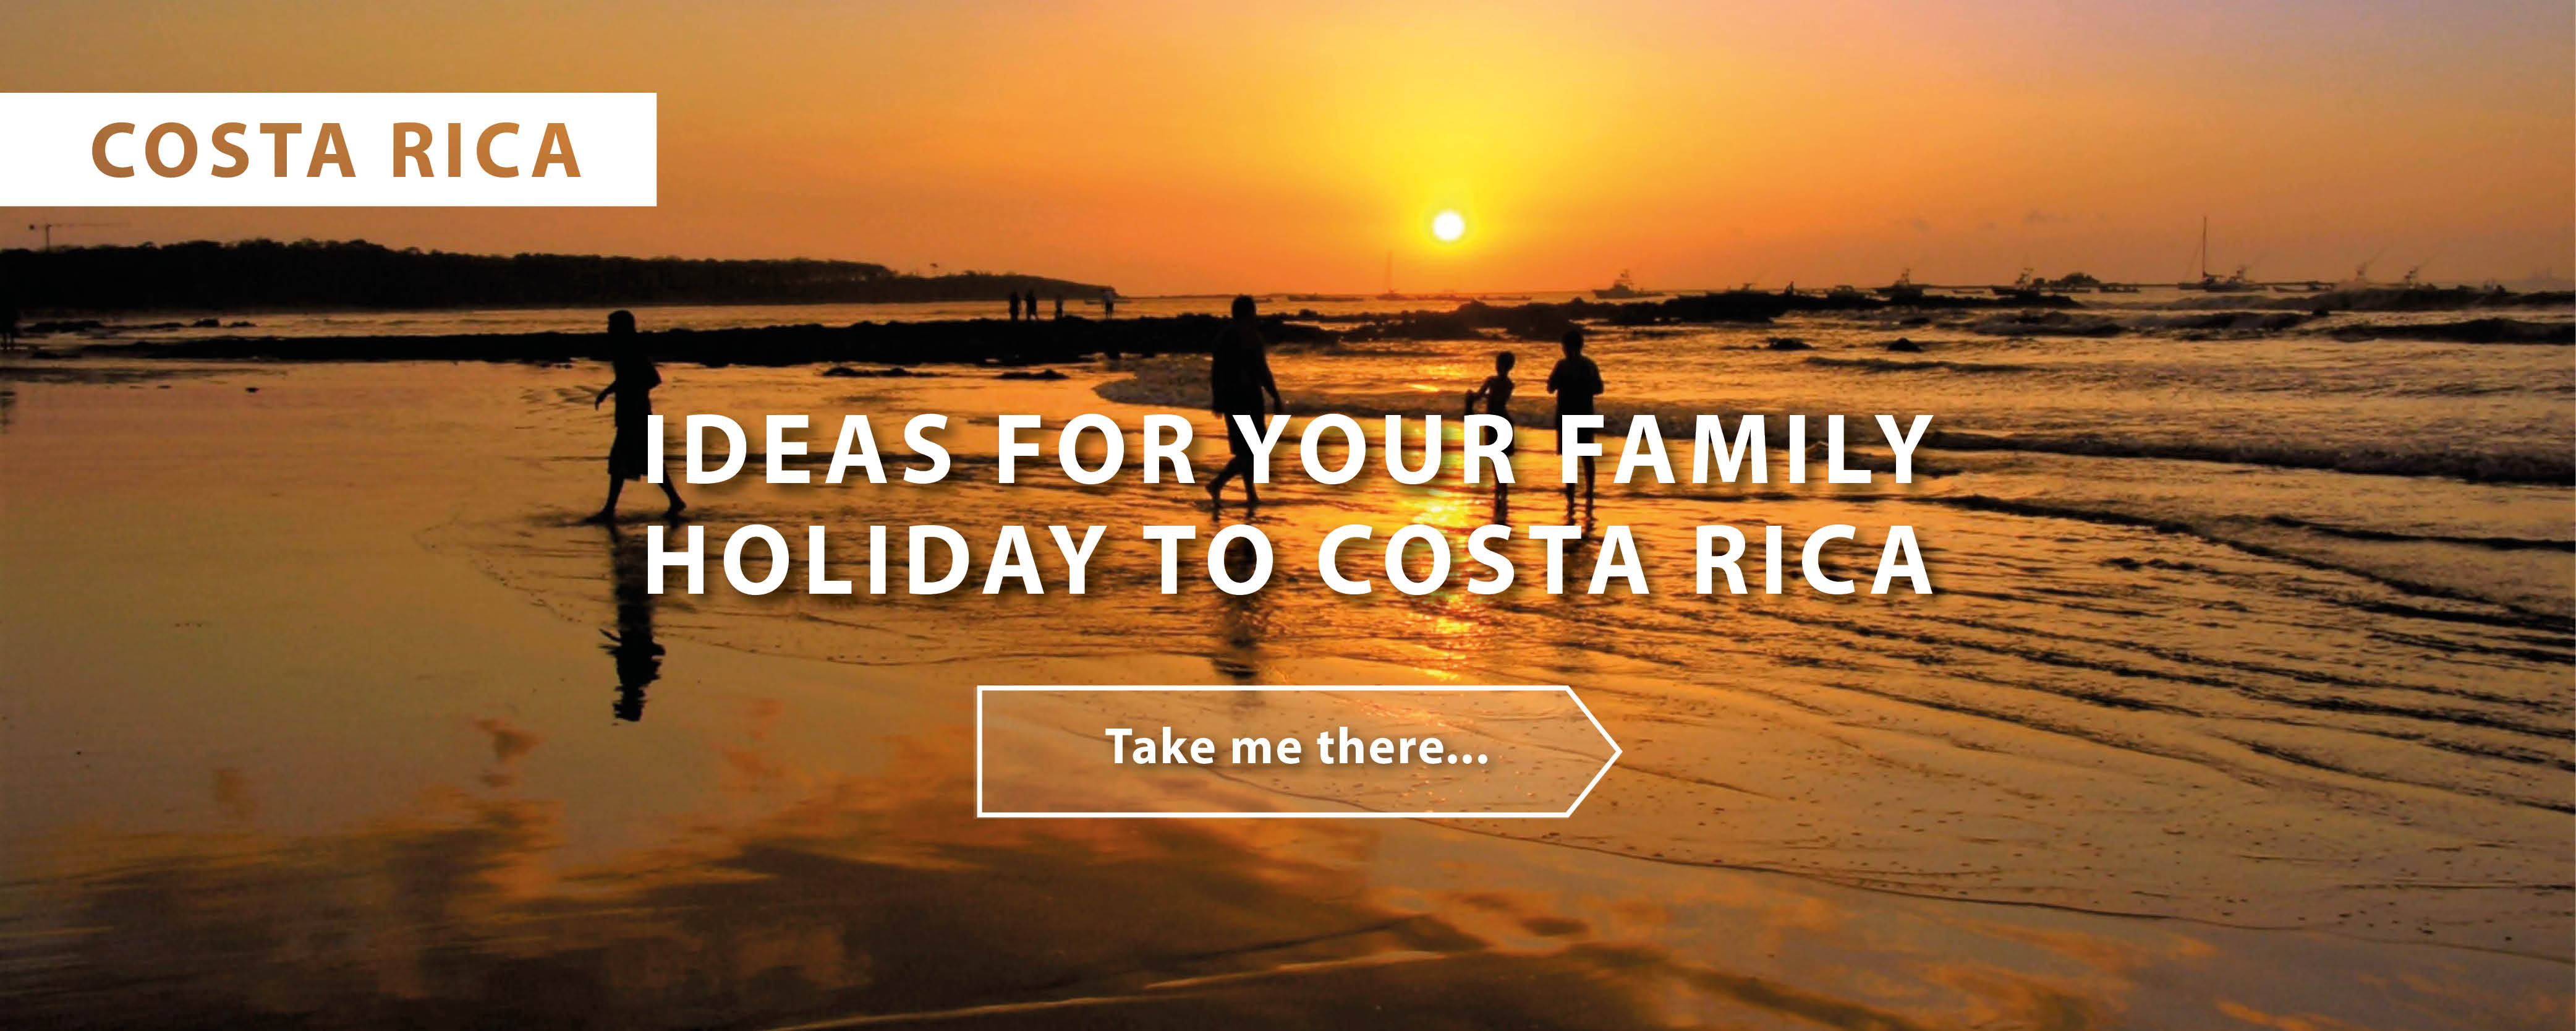 Costa Rica Holiday Architects